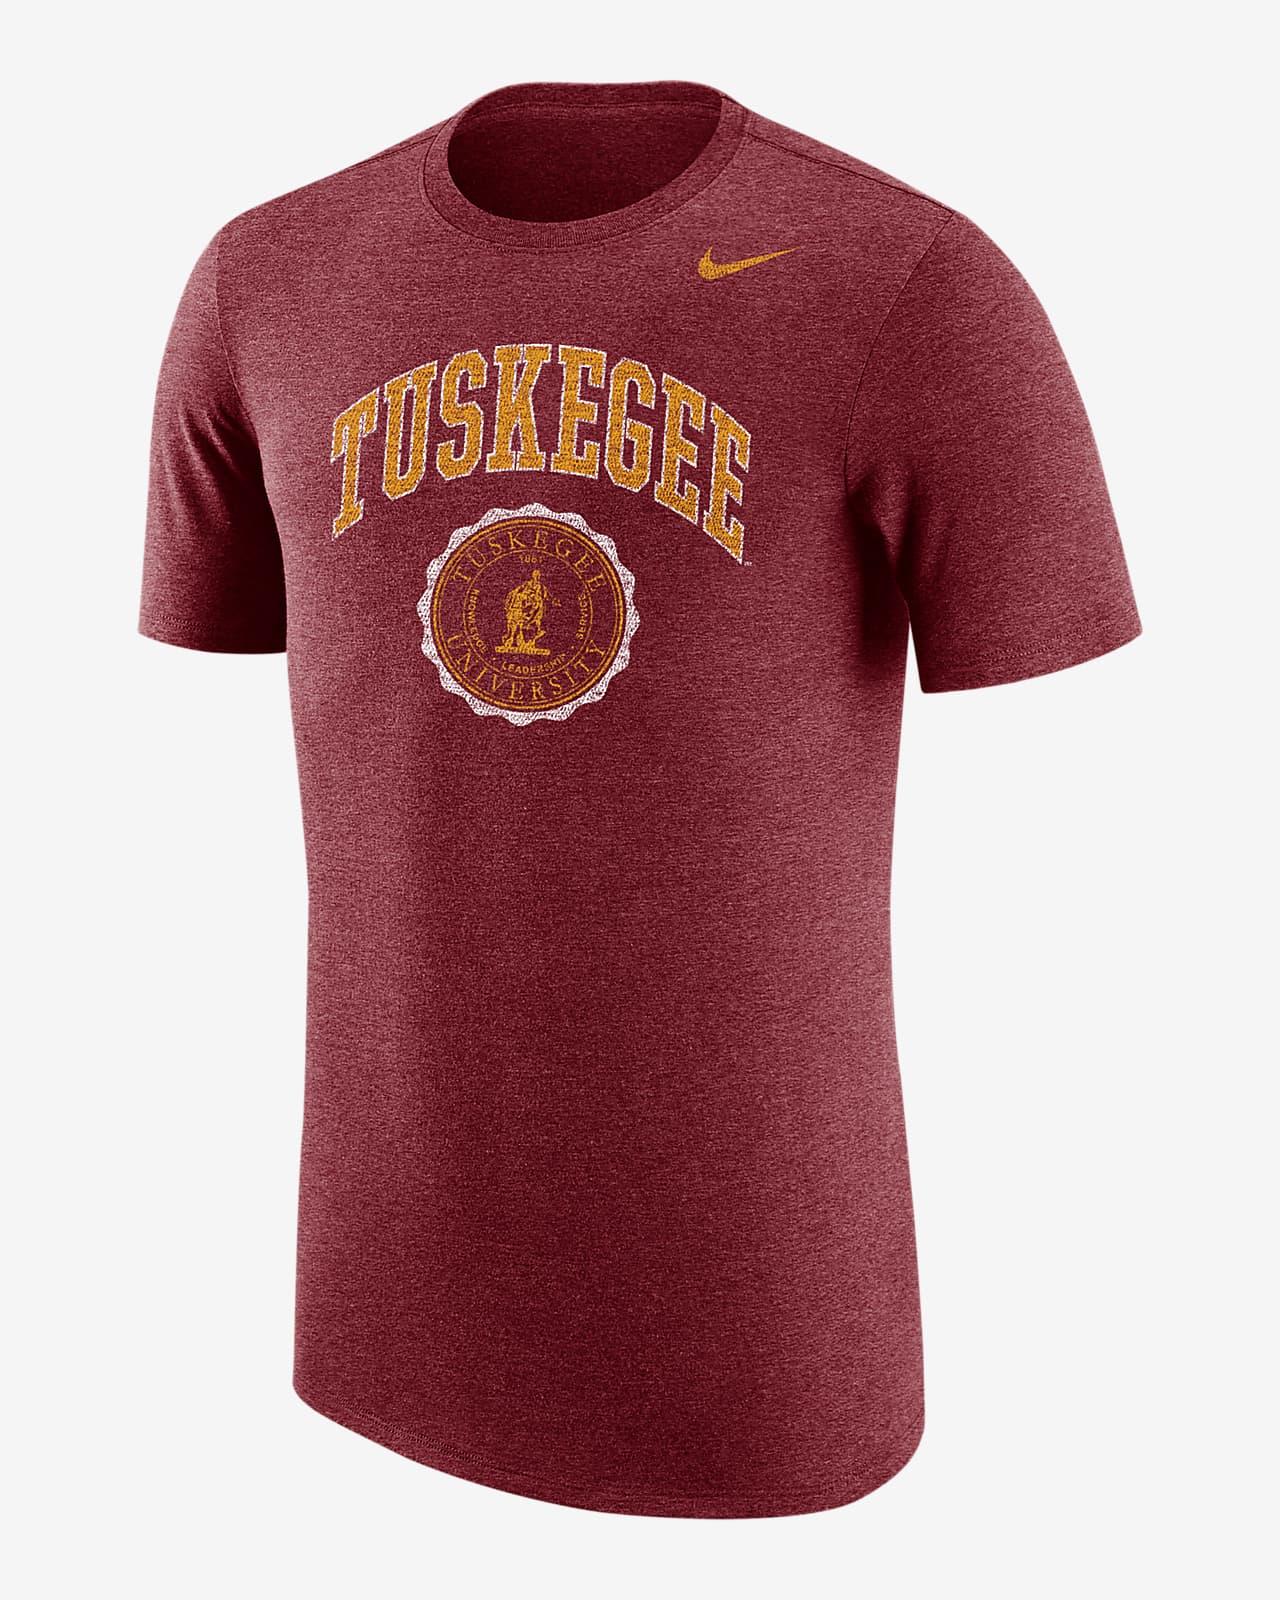 Nike College (Tuskegee) Men's T-Shirt